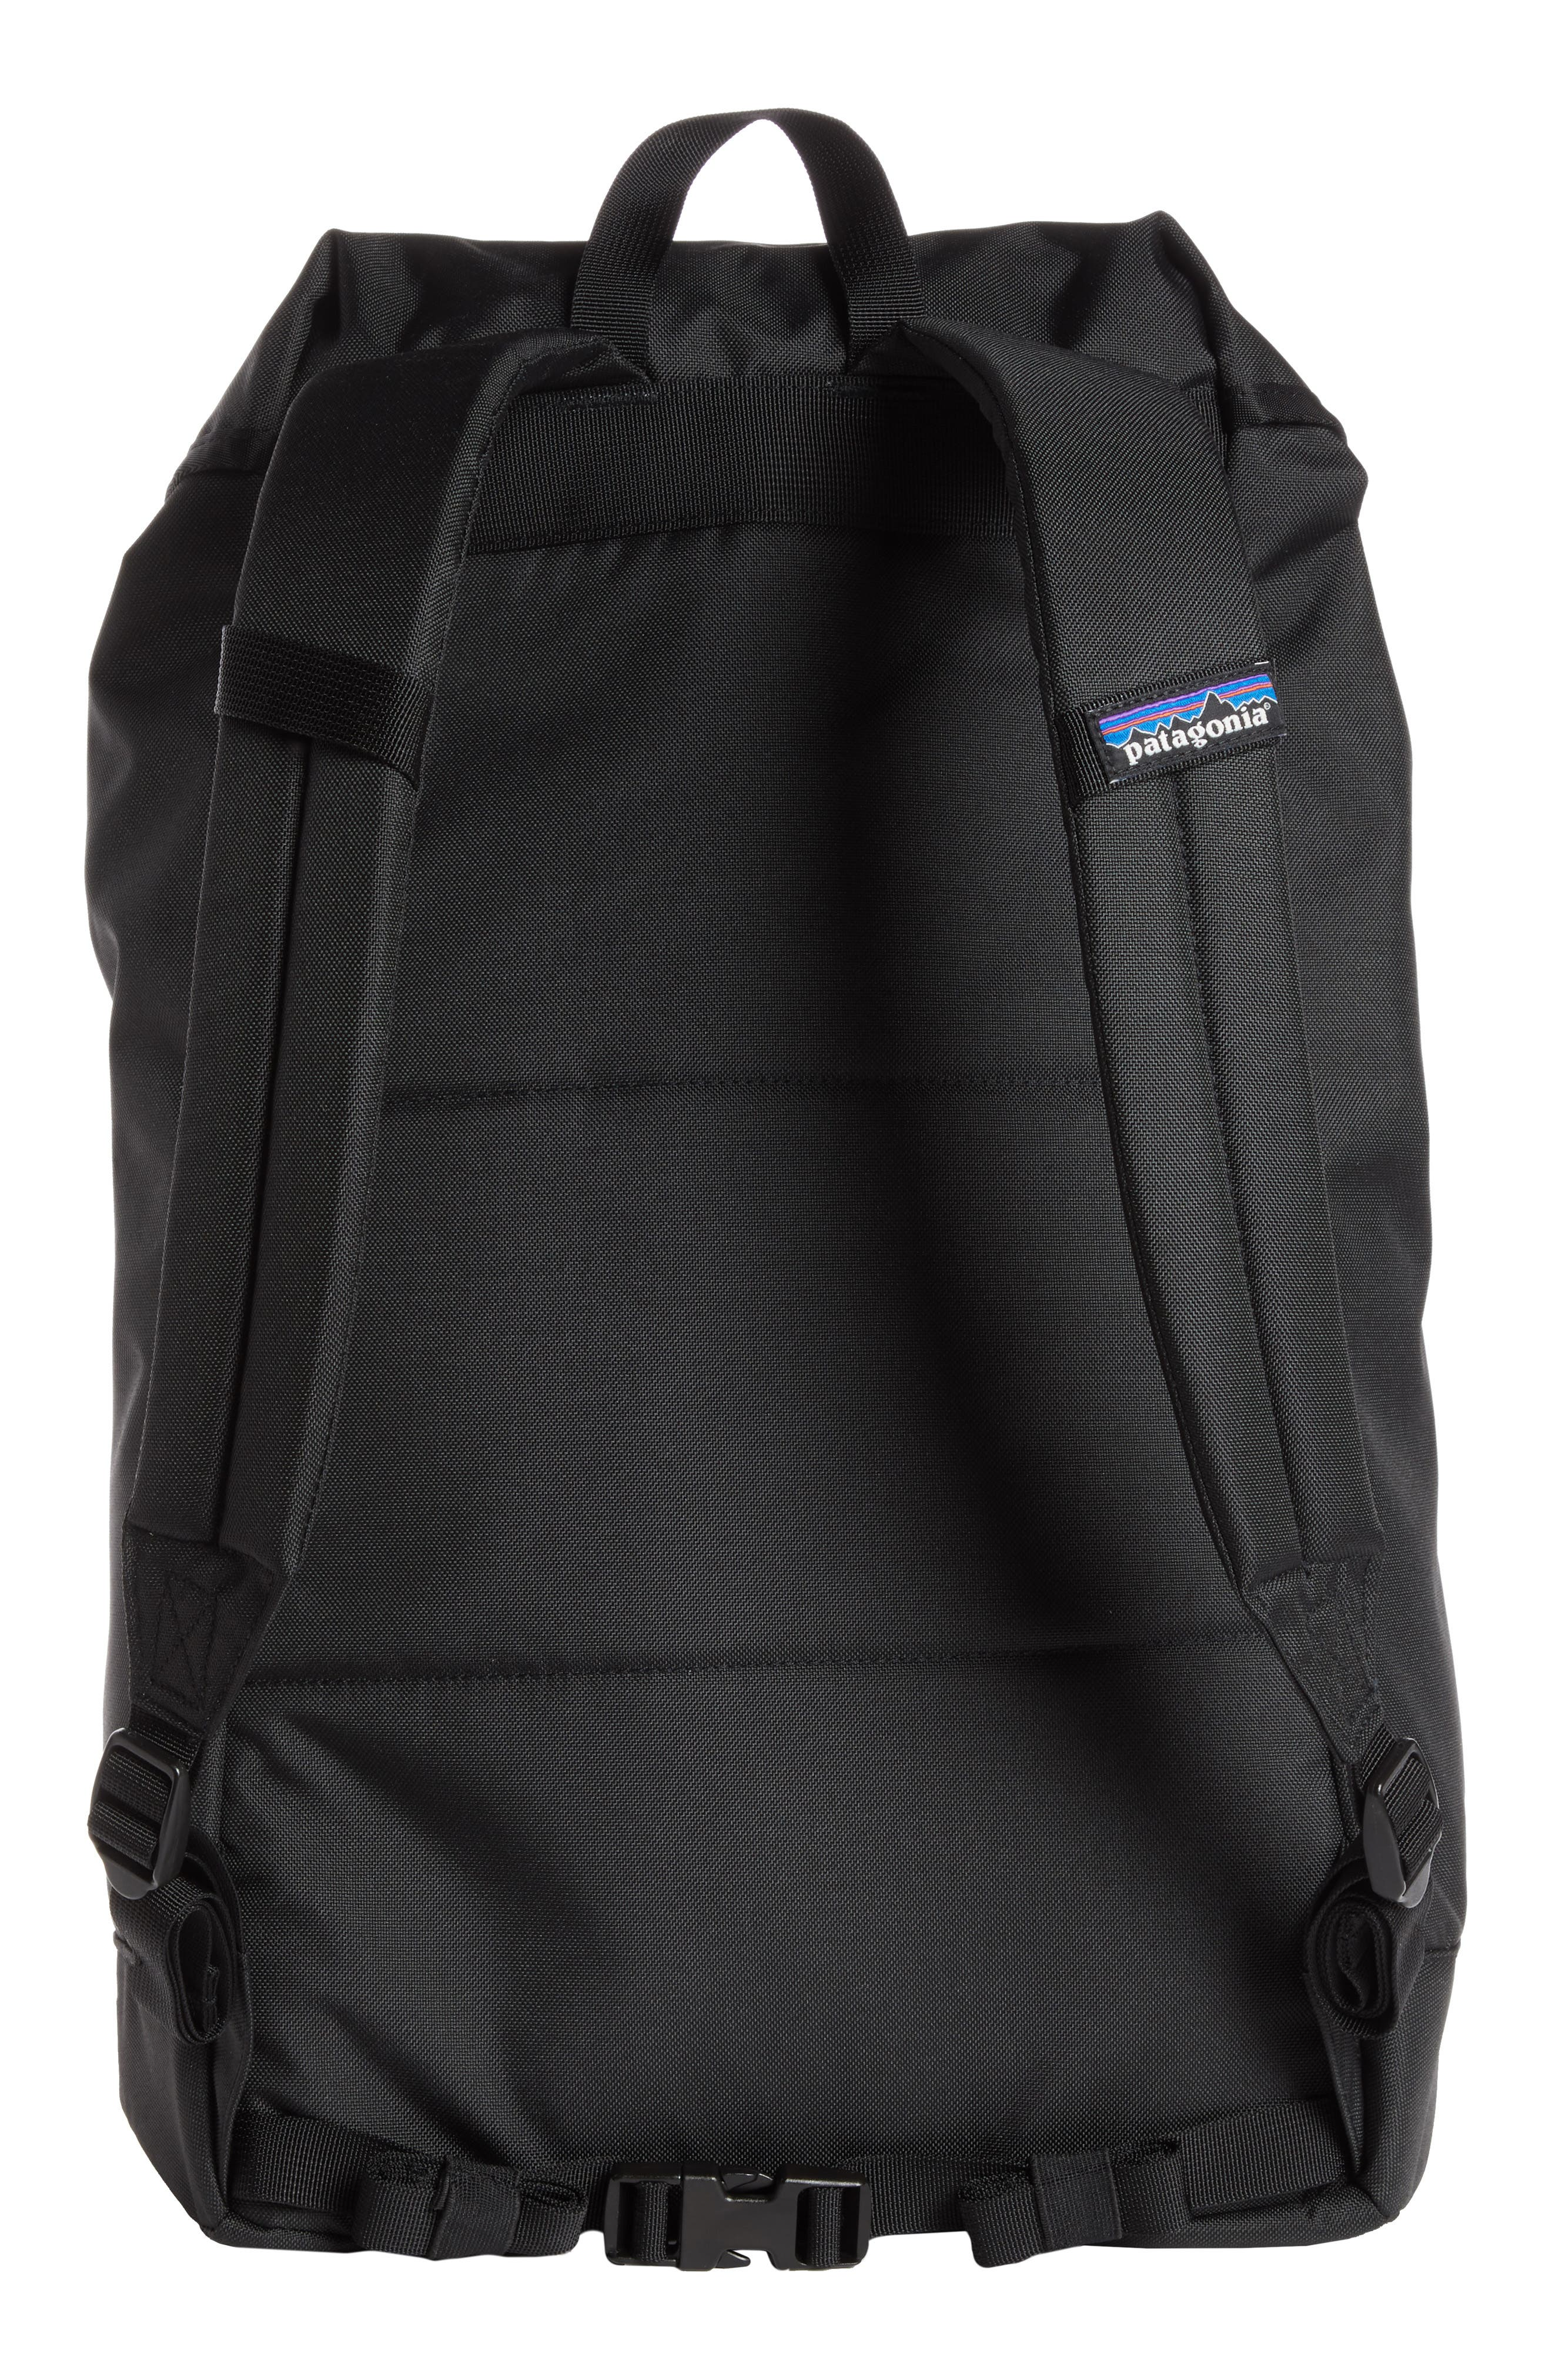 PATAGONIA,                             Arbor 25-Liter Backpack,                             Alternate thumbnail 3, color,                             001